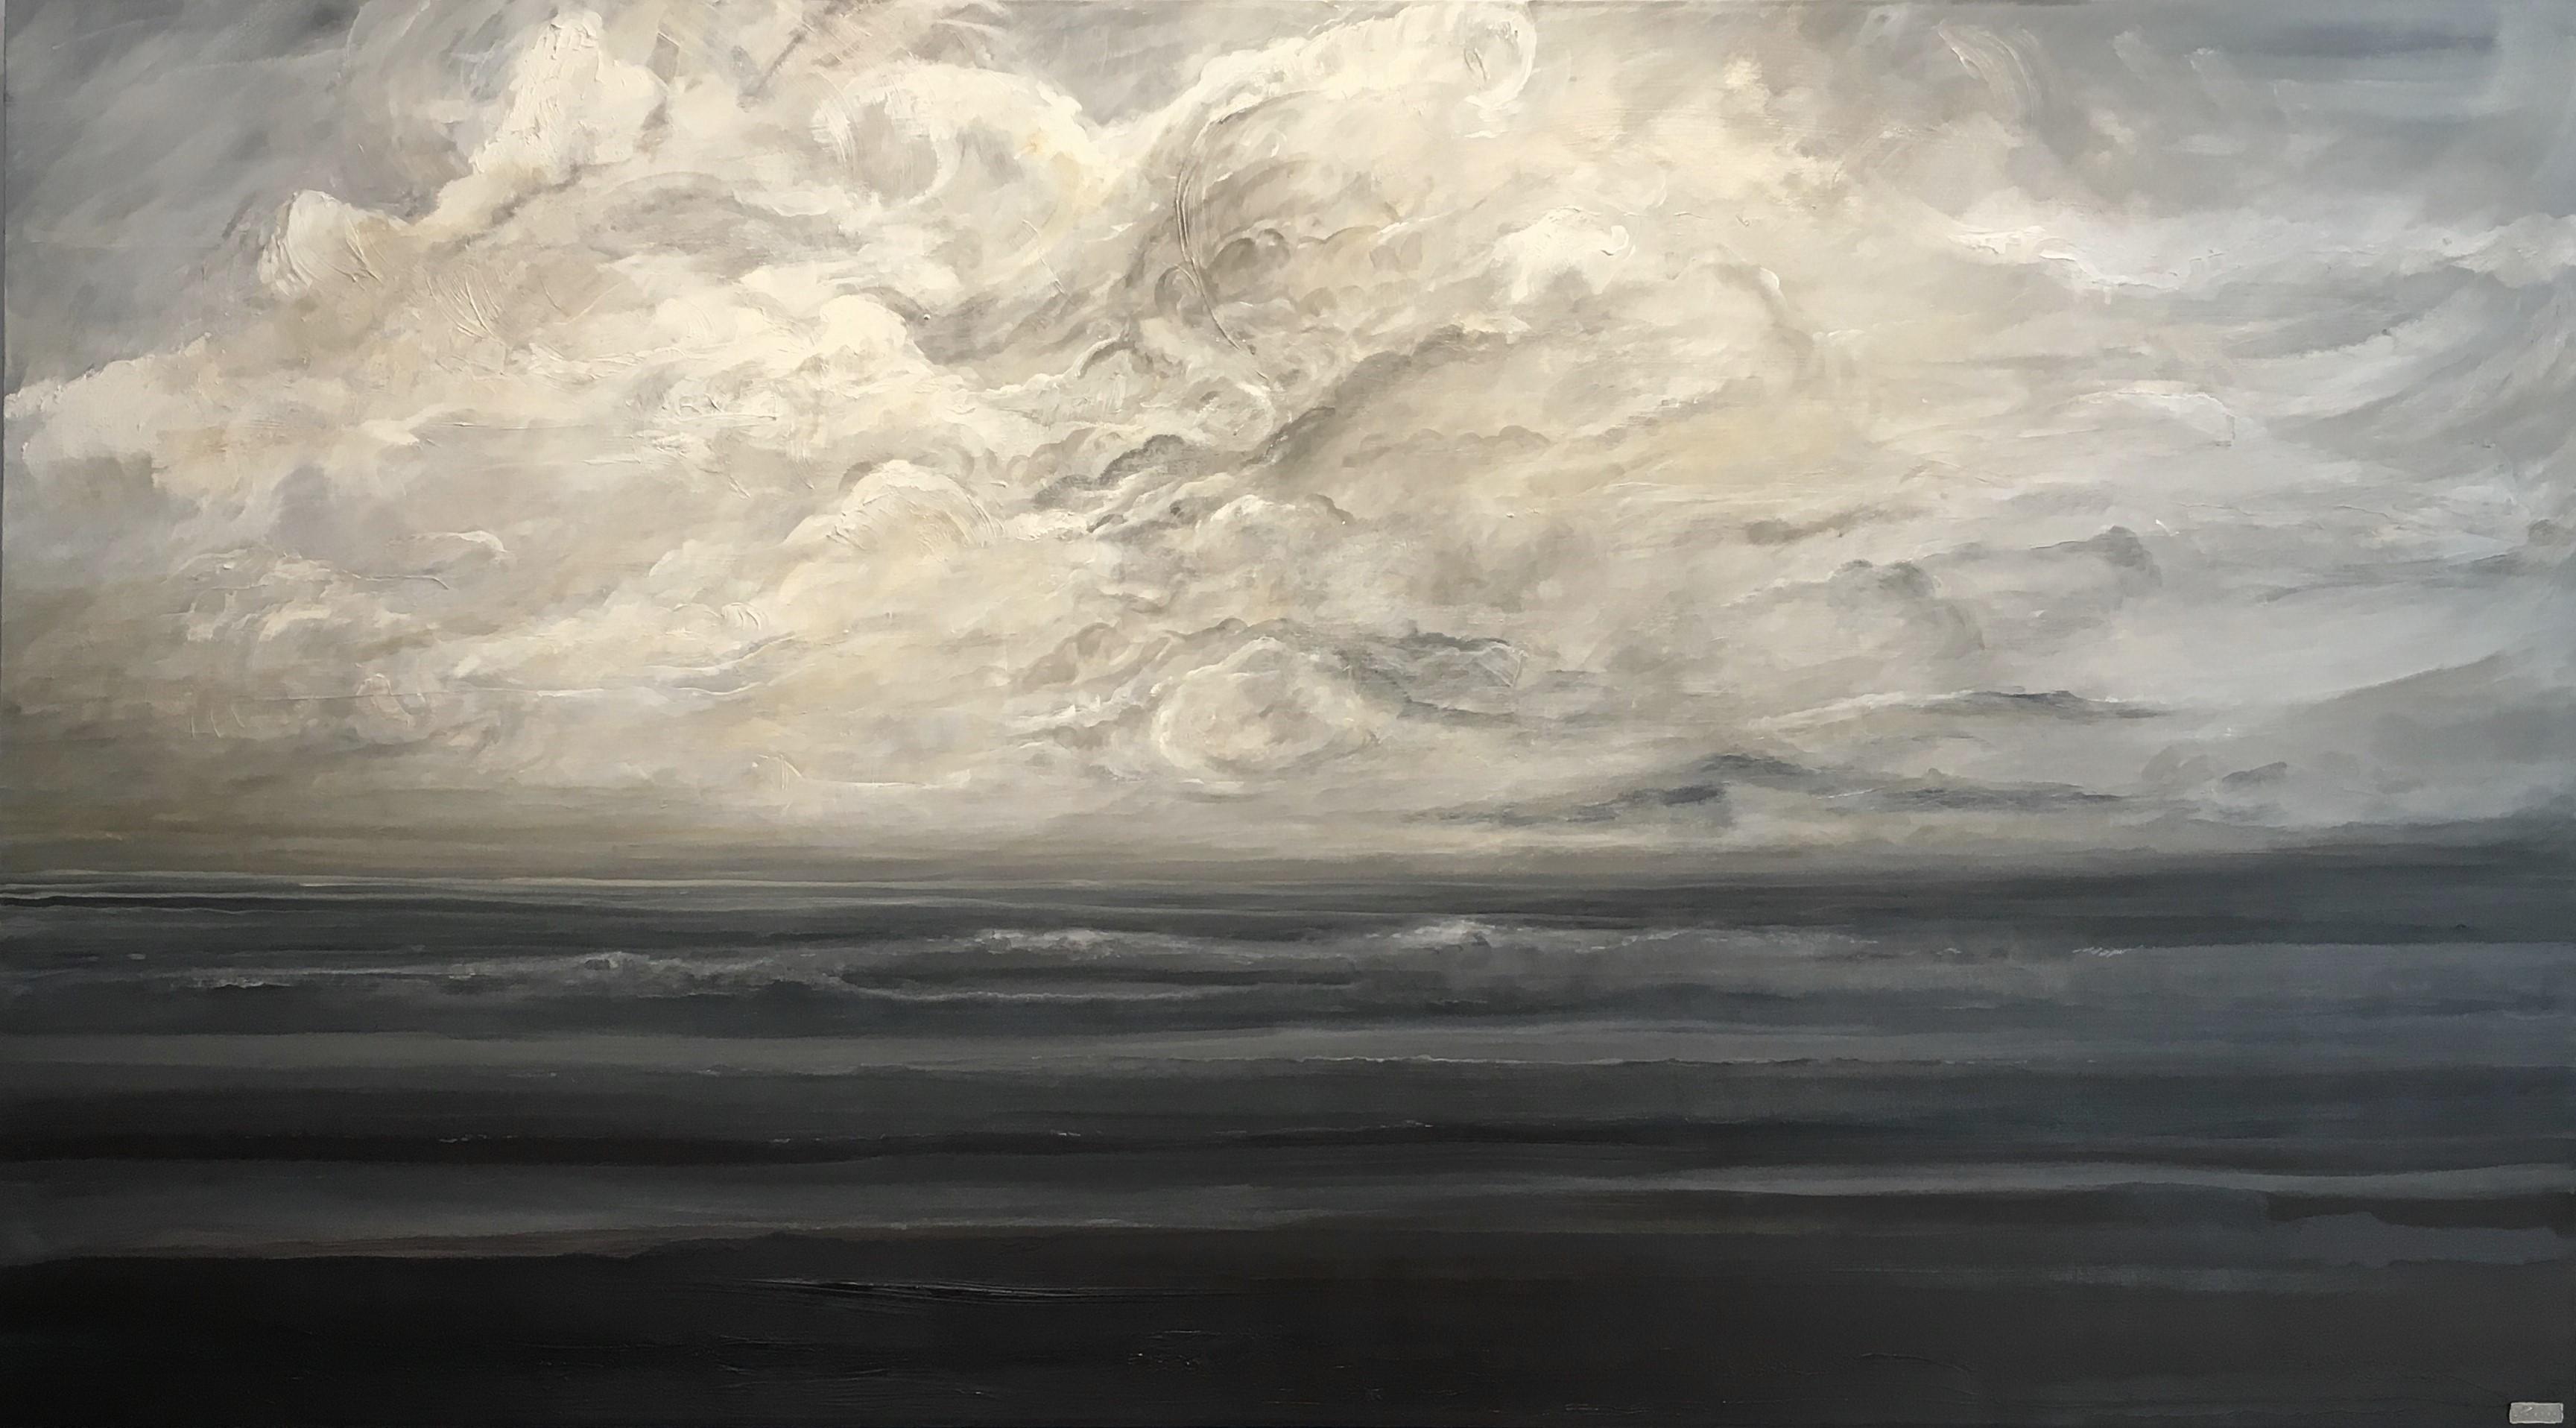 Seascape no.47, KRIIN (2019)